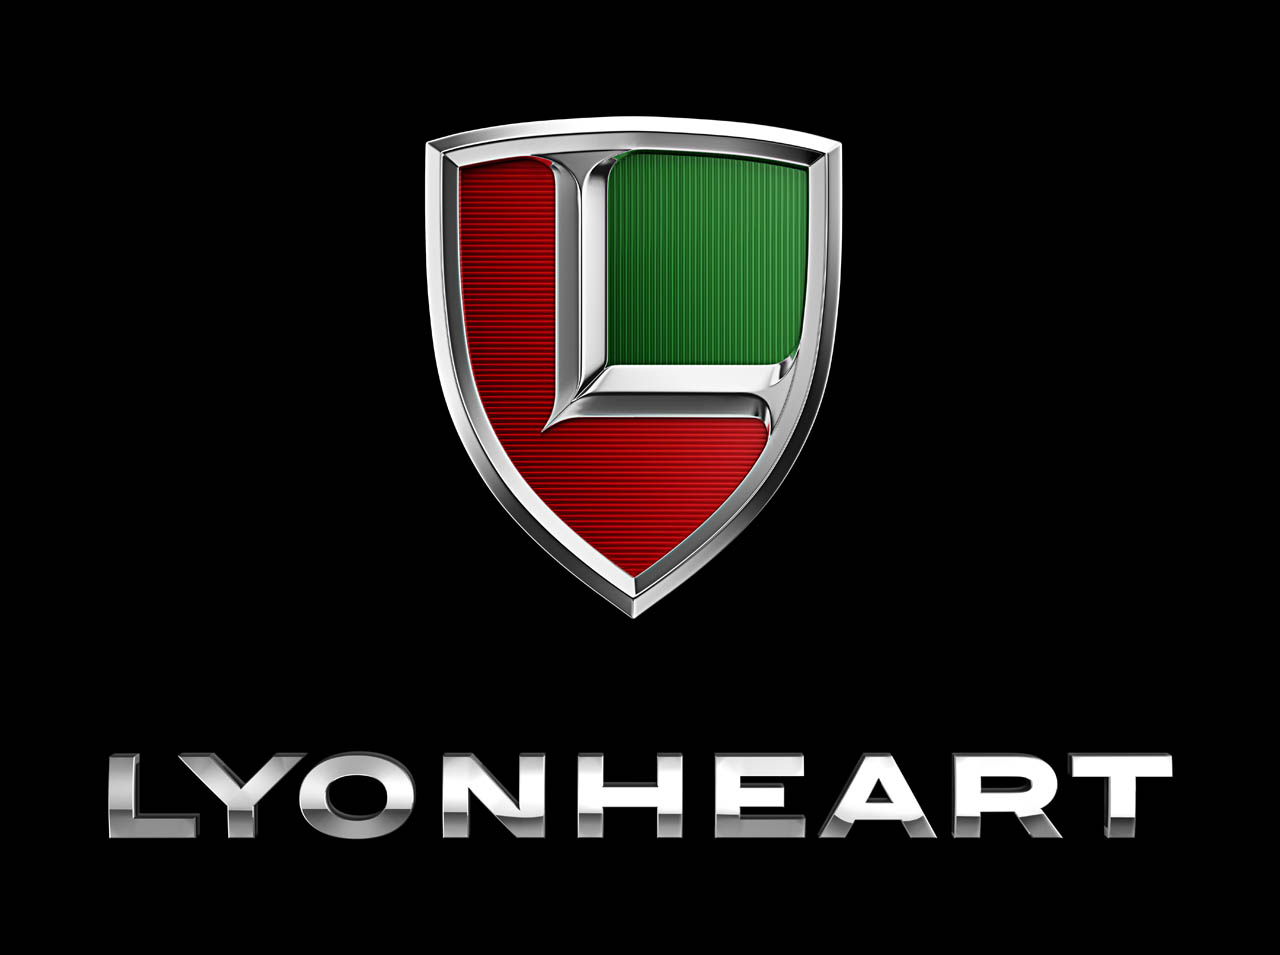 Lyonheart Logo Wallpaper